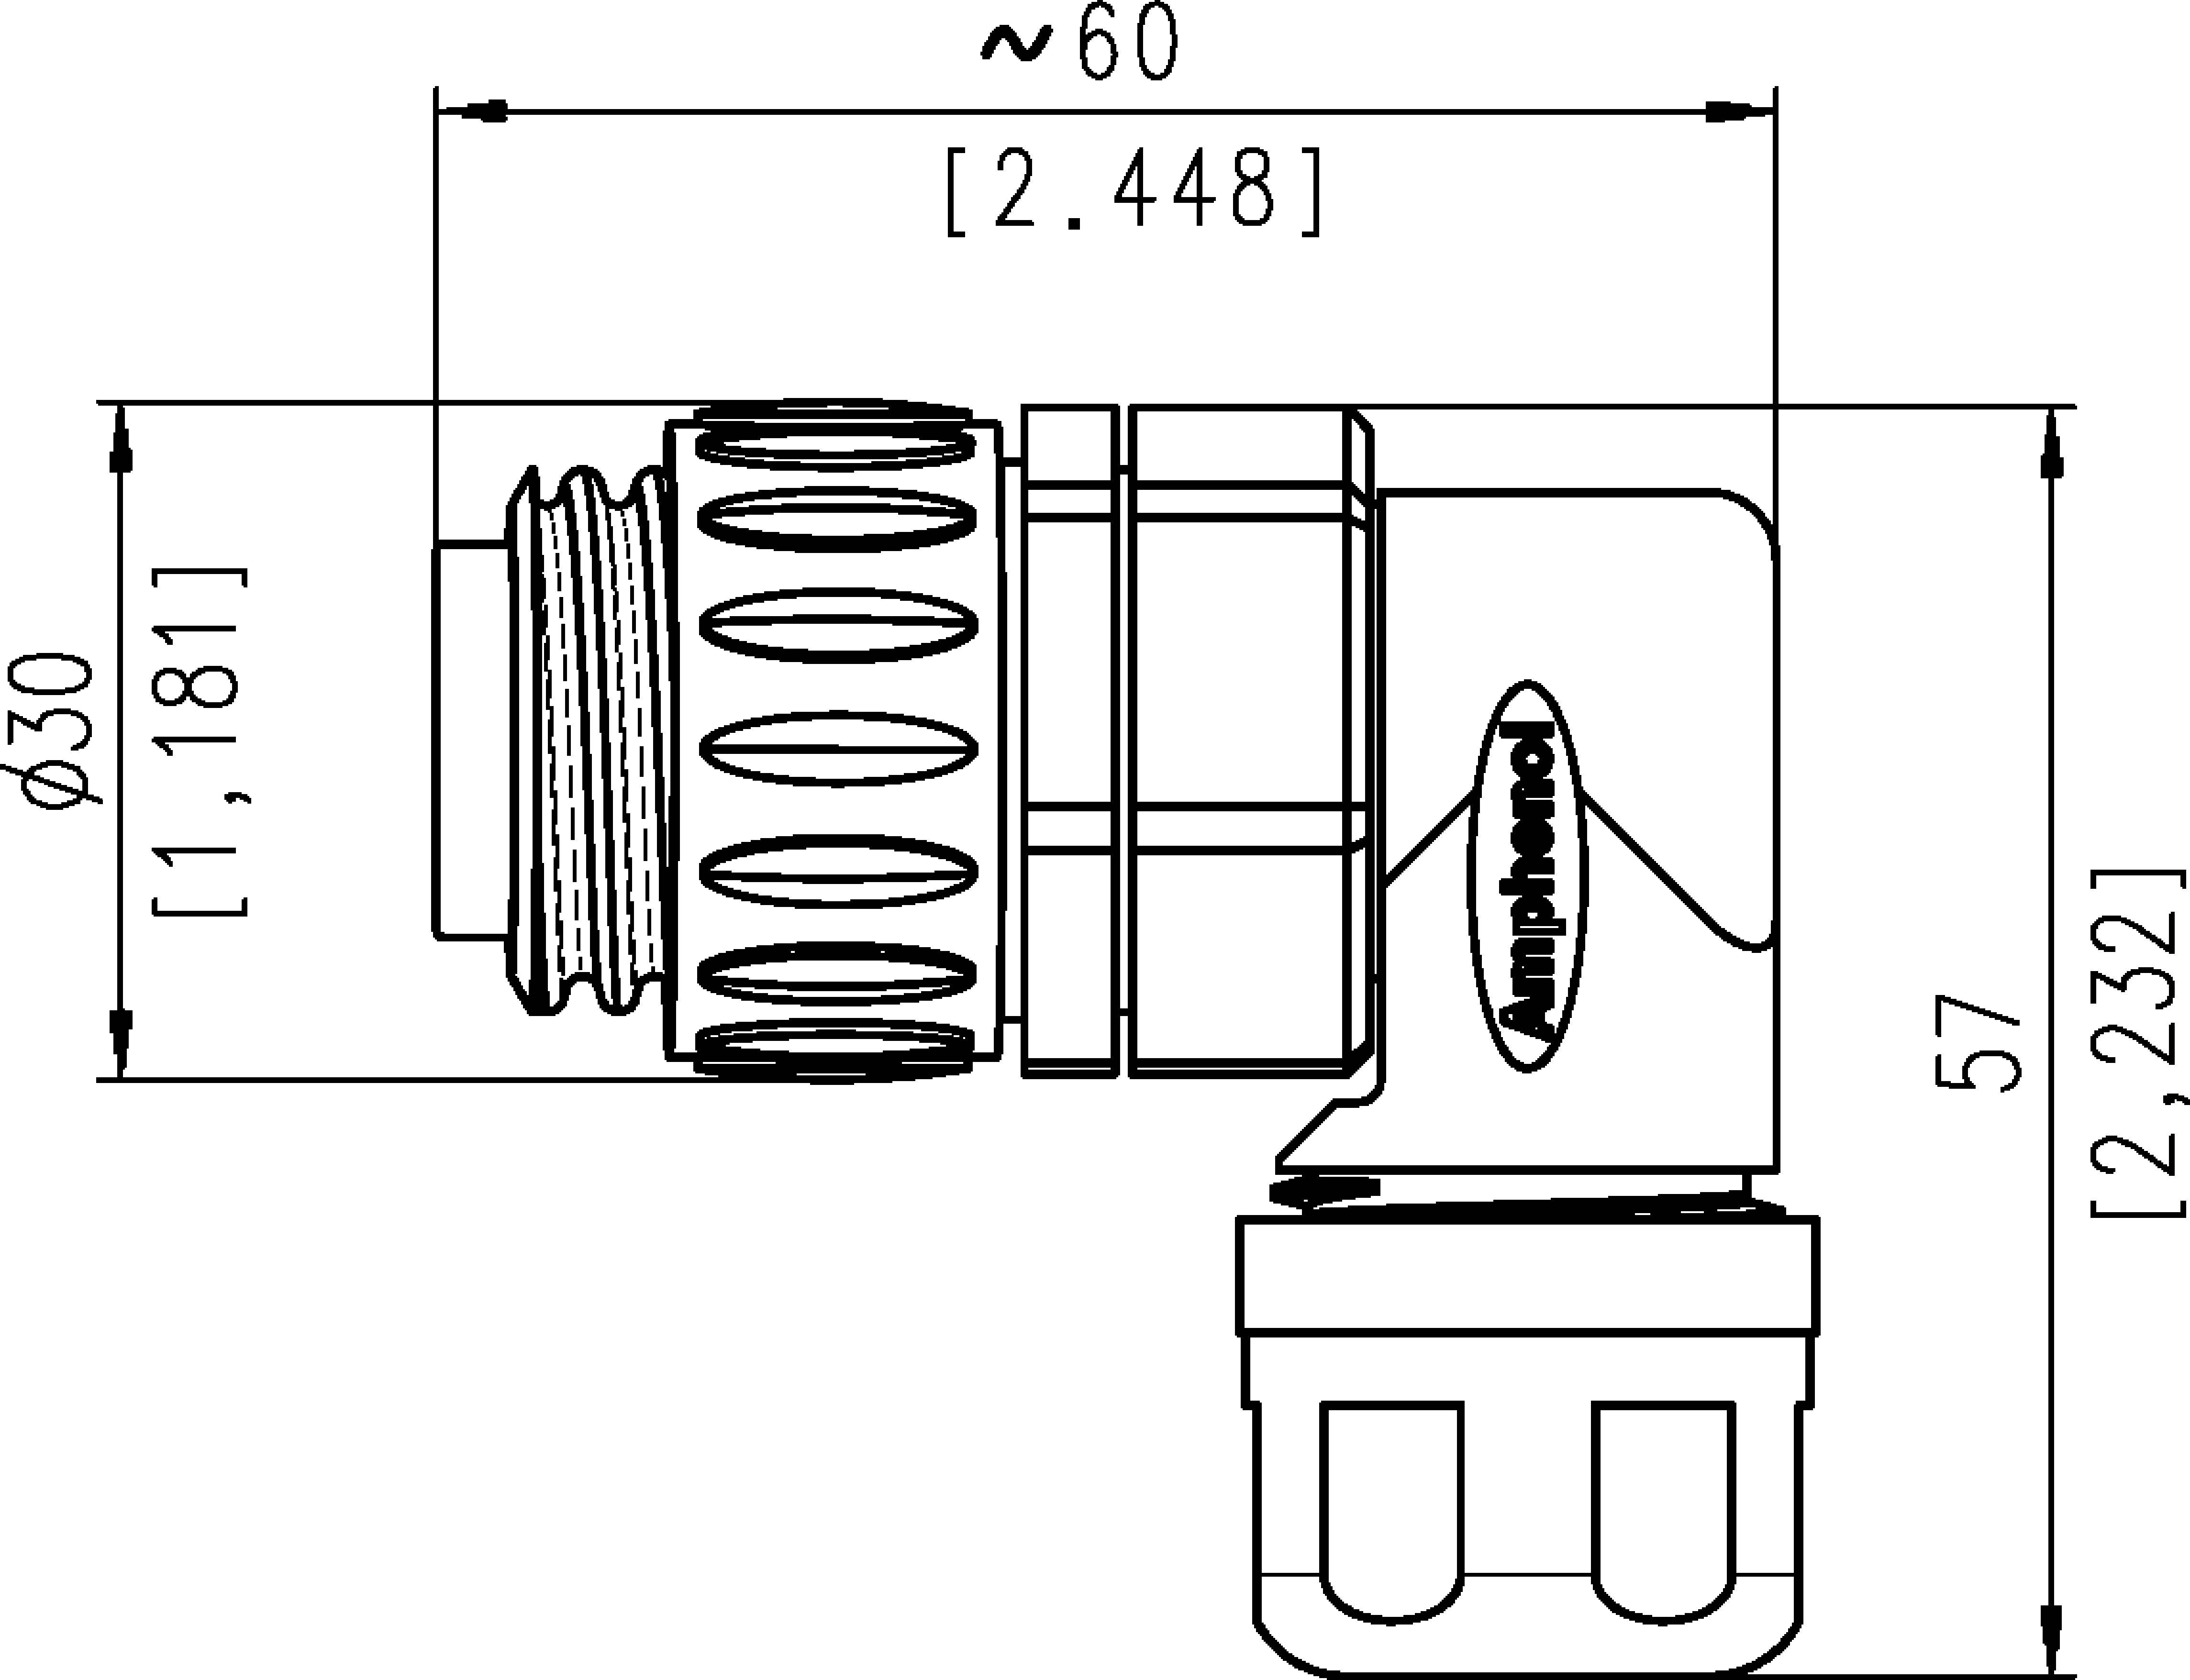 Guľatý faston Amphenol C016 30K006 100 12 IP67 (v zablokovanom stave), polyamid 6.6, pólů 6 + PE, 1 ks